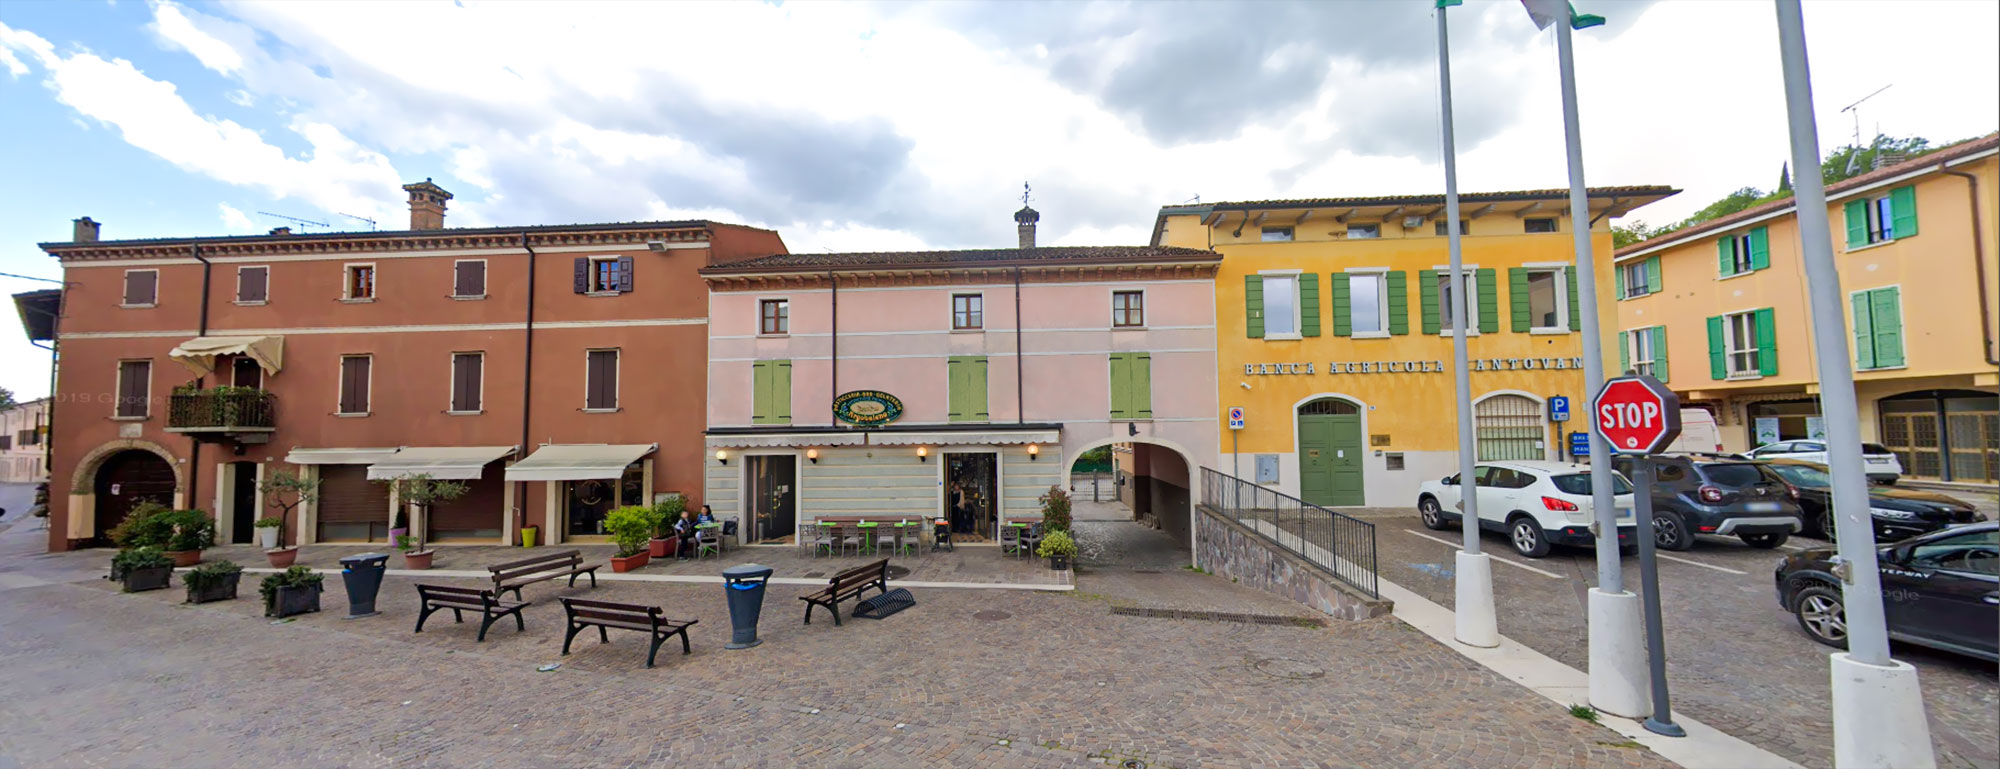 Pasticceria Bar Gelateria Arcobaleno a Solferino (Mantova)